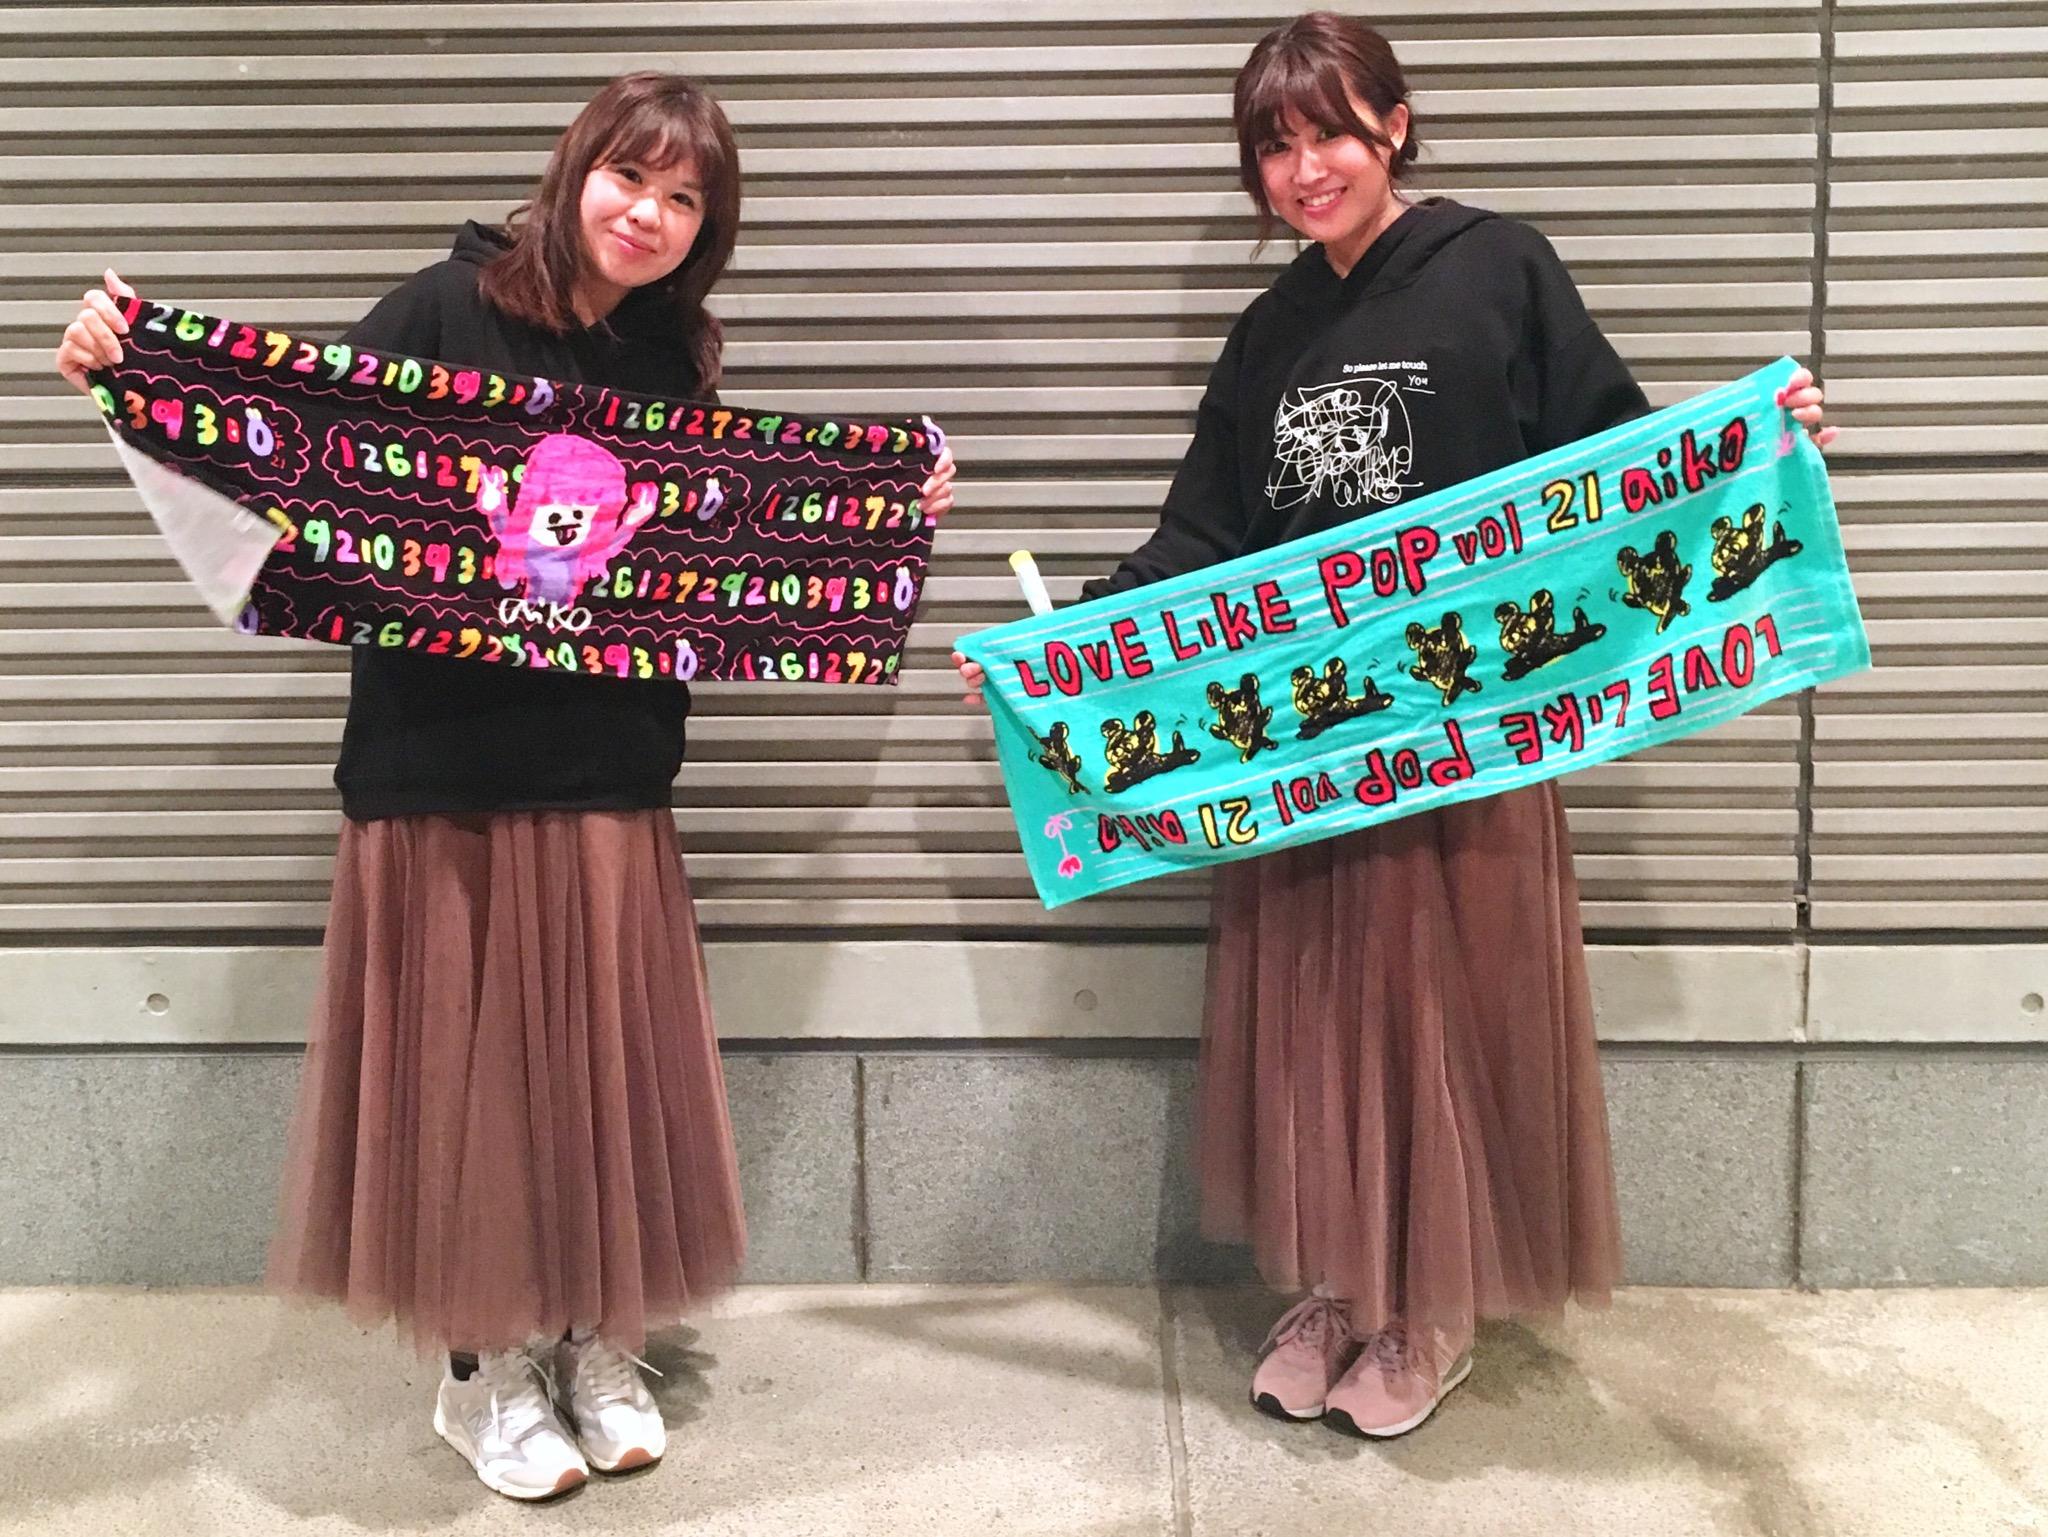 aiko『LOVE LIKE POP vol.21』16年ぶりライブ参戦!!_3